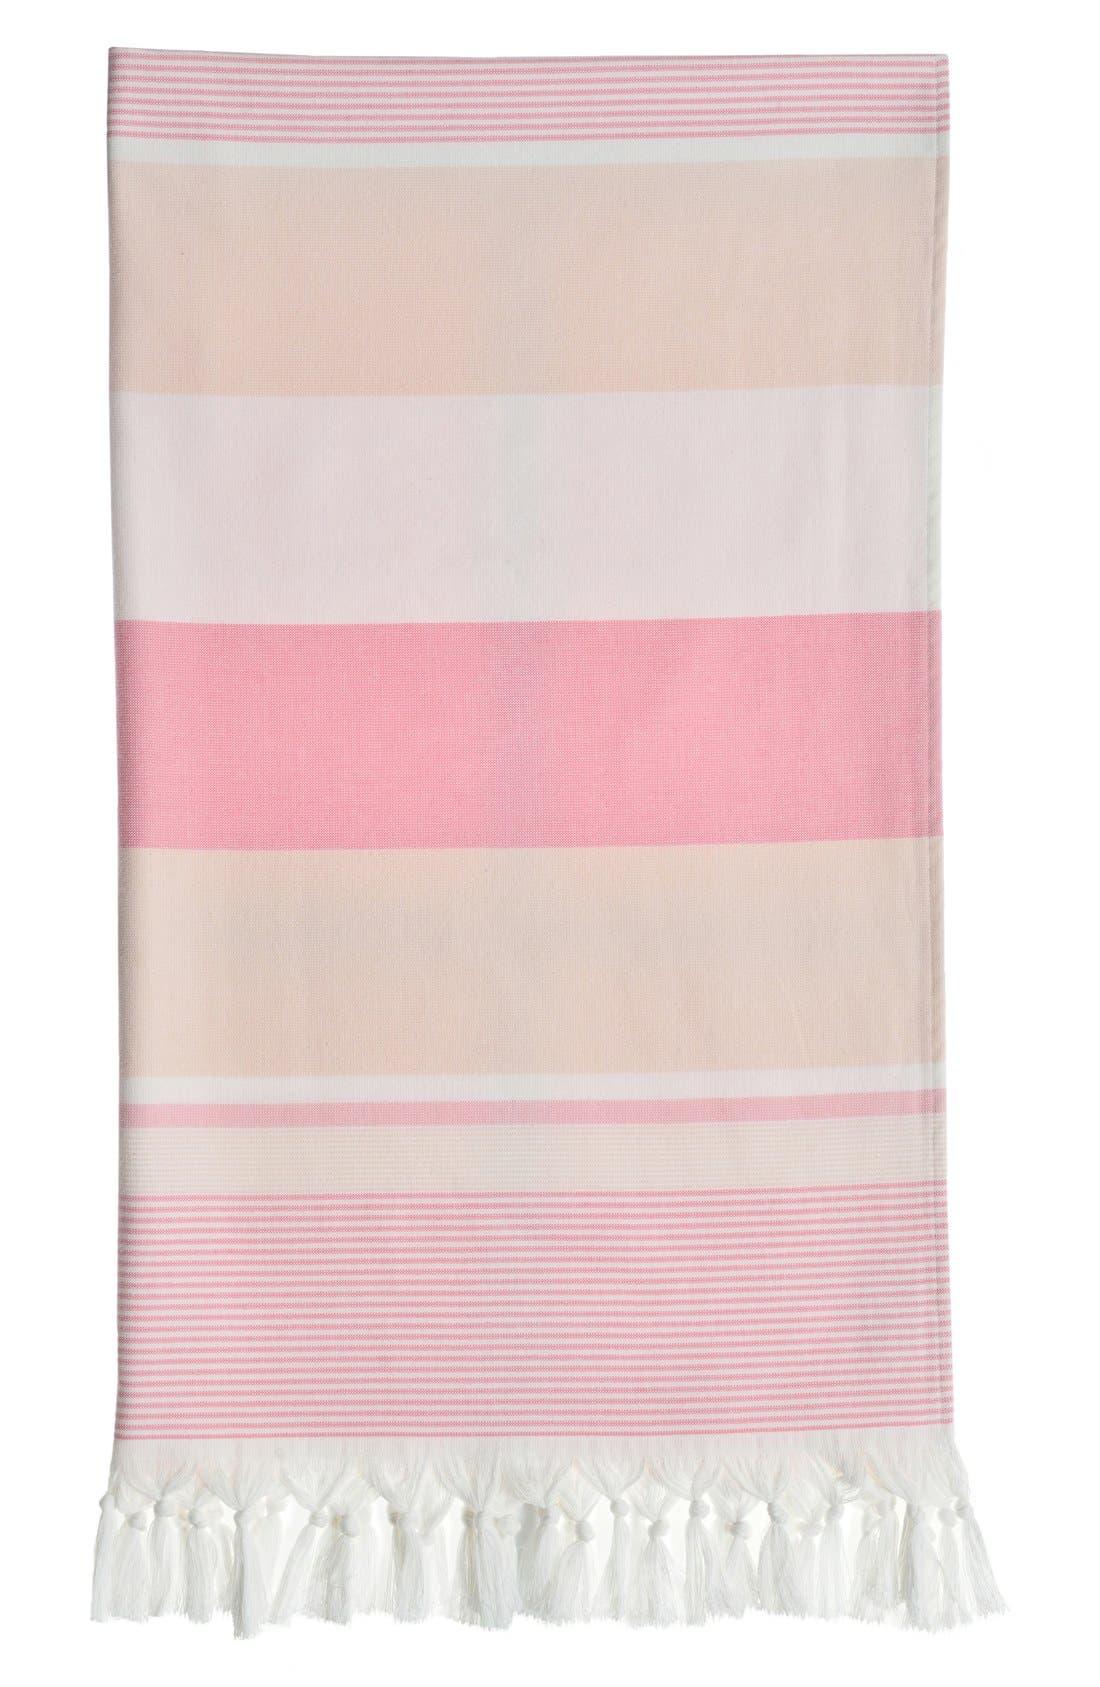 Alternate Image 3  - Linum Home Textiles 'Summer Loving' Turkish Pestemal Towel